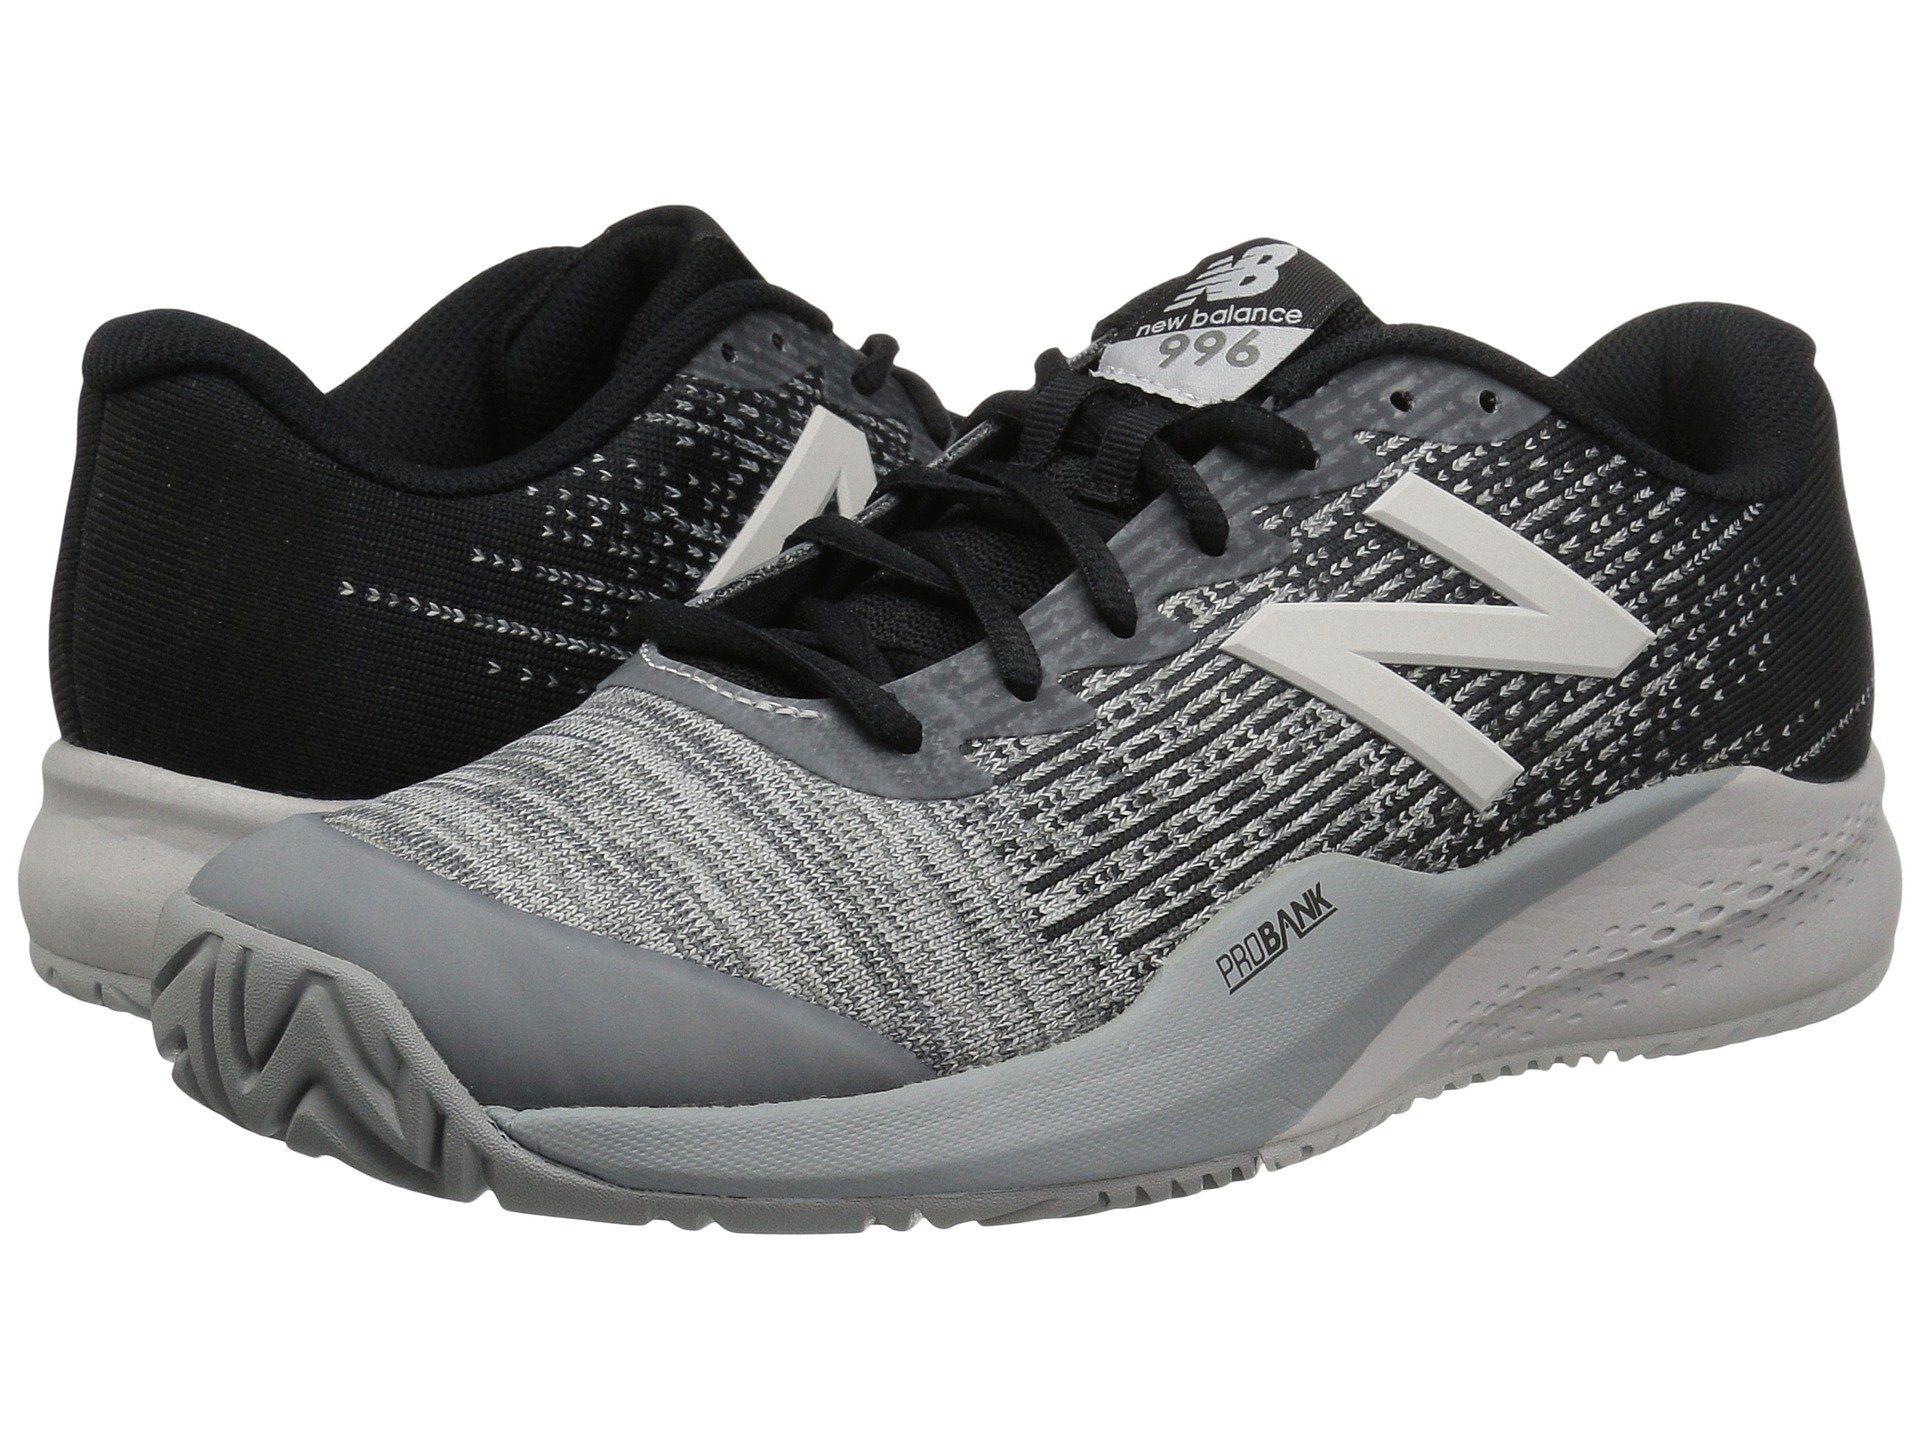 new balance 996v3 tennis shoes £95 new balance